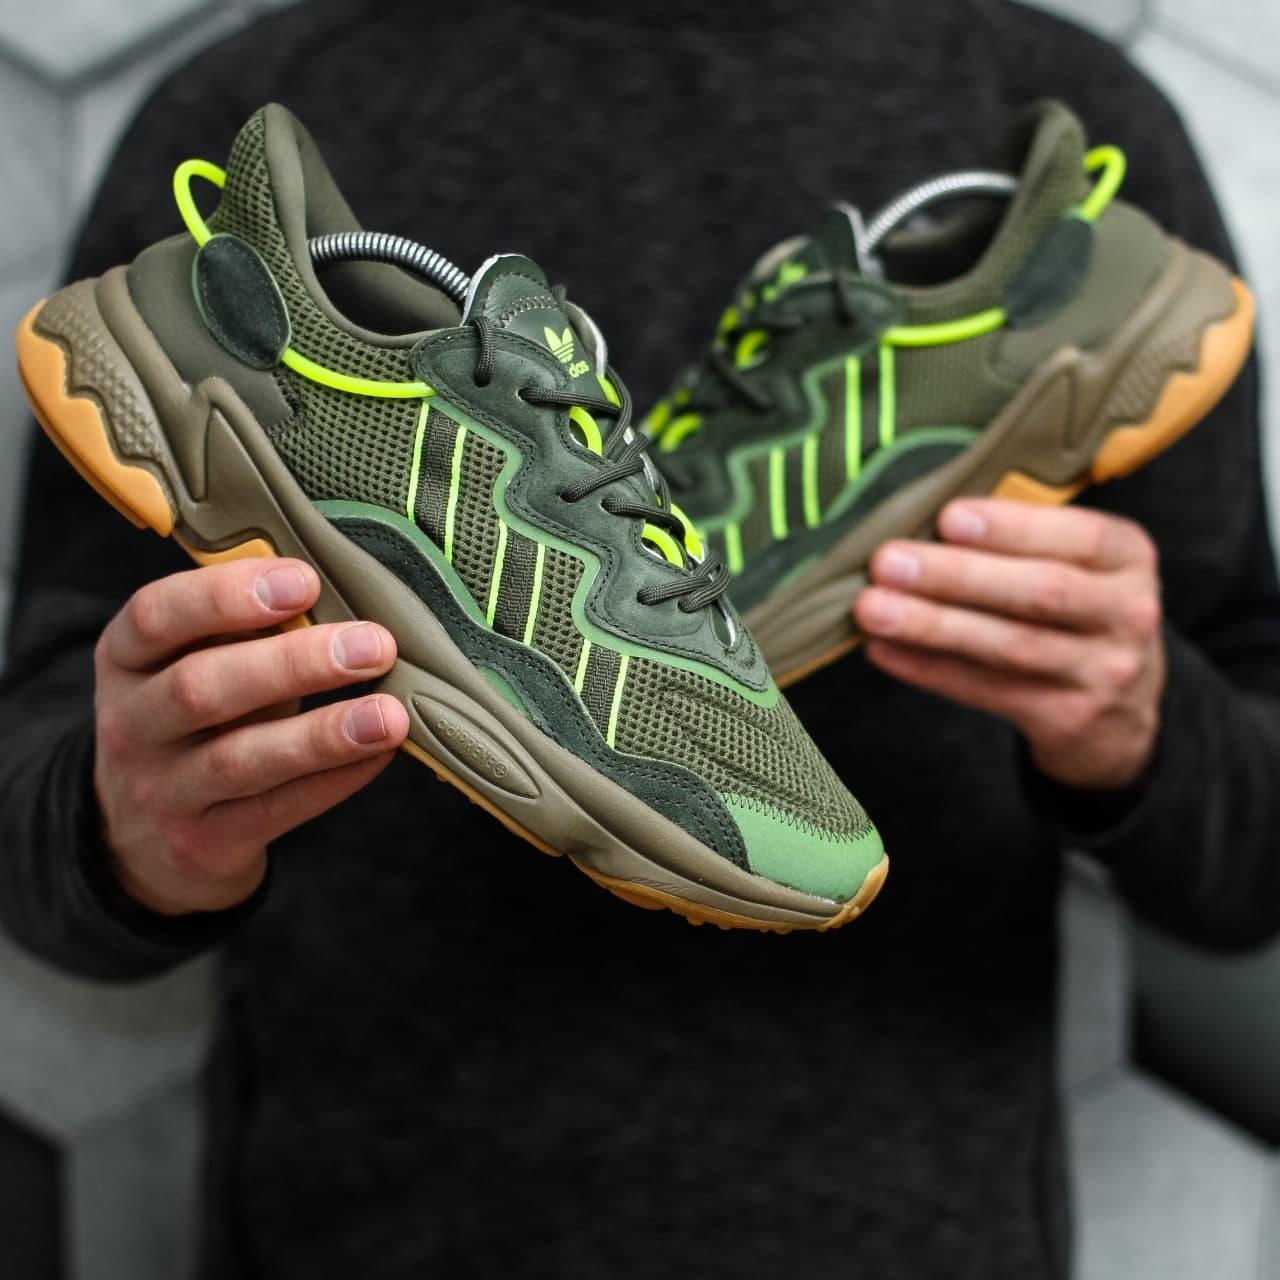 Мужские кроссовки Adidas Ozweego Adiprene pride